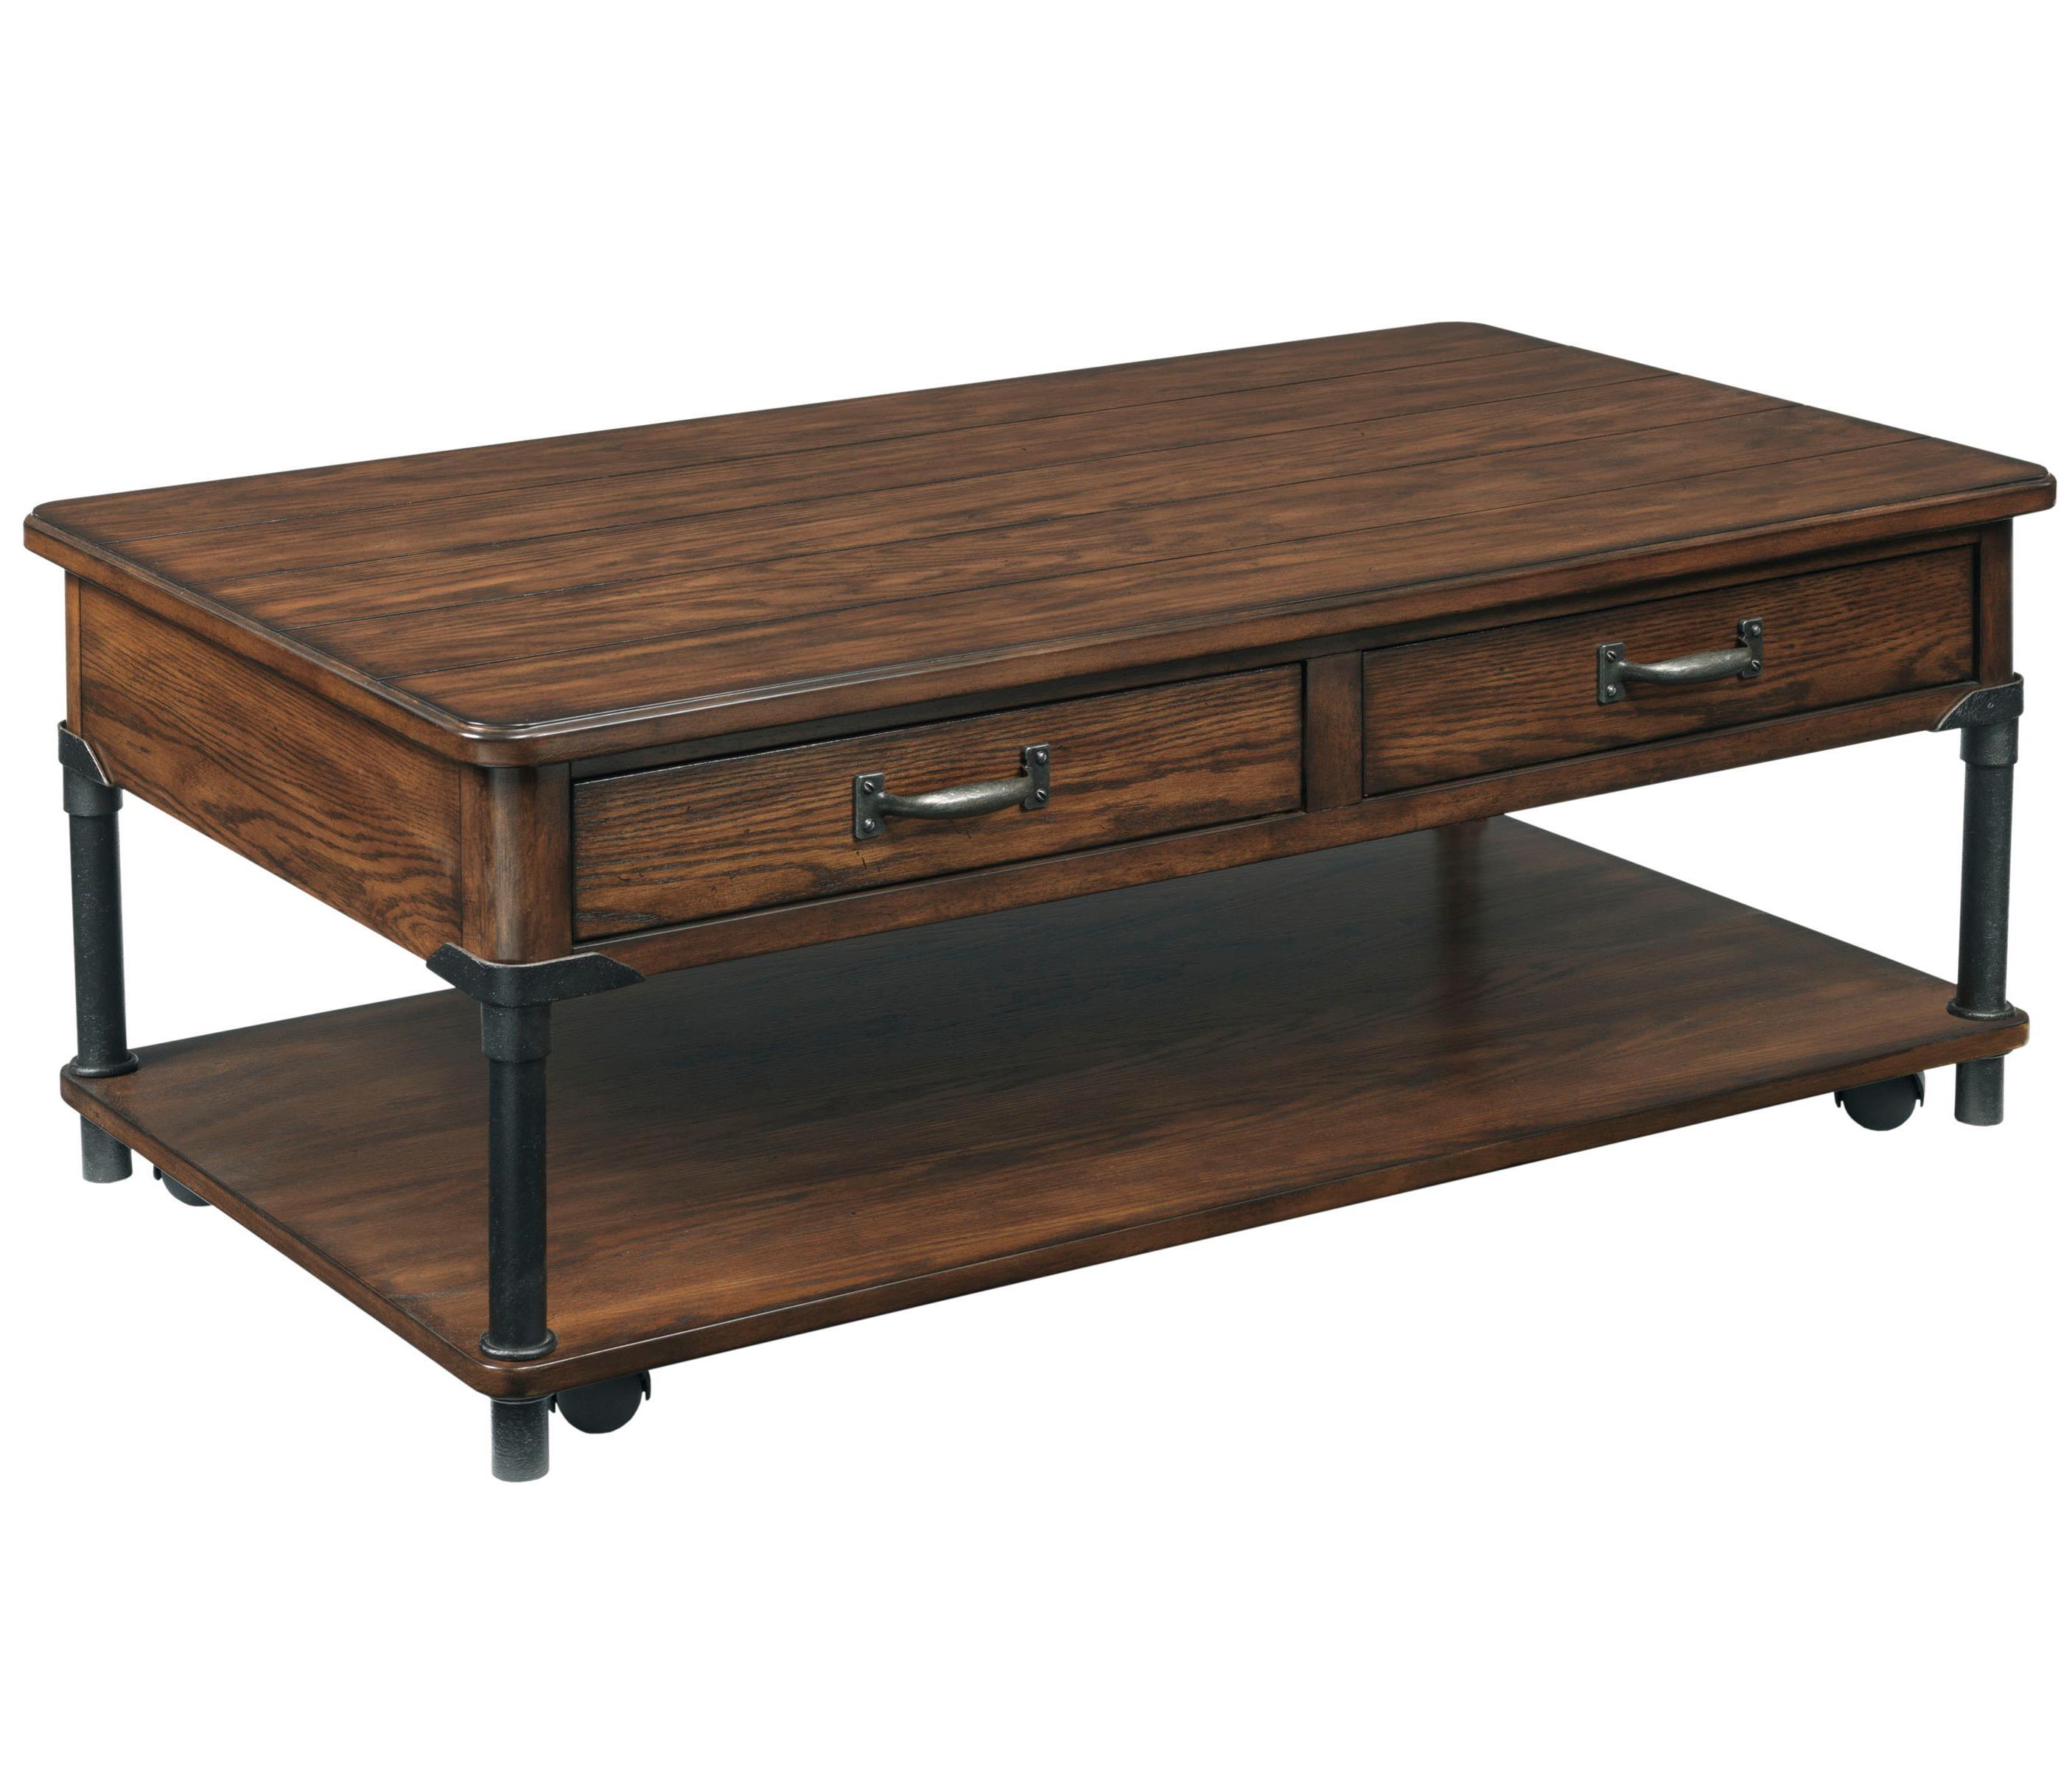 Broyhill Furniture Saluda Rectangular Cocktail Table - Item Number: 3353-001